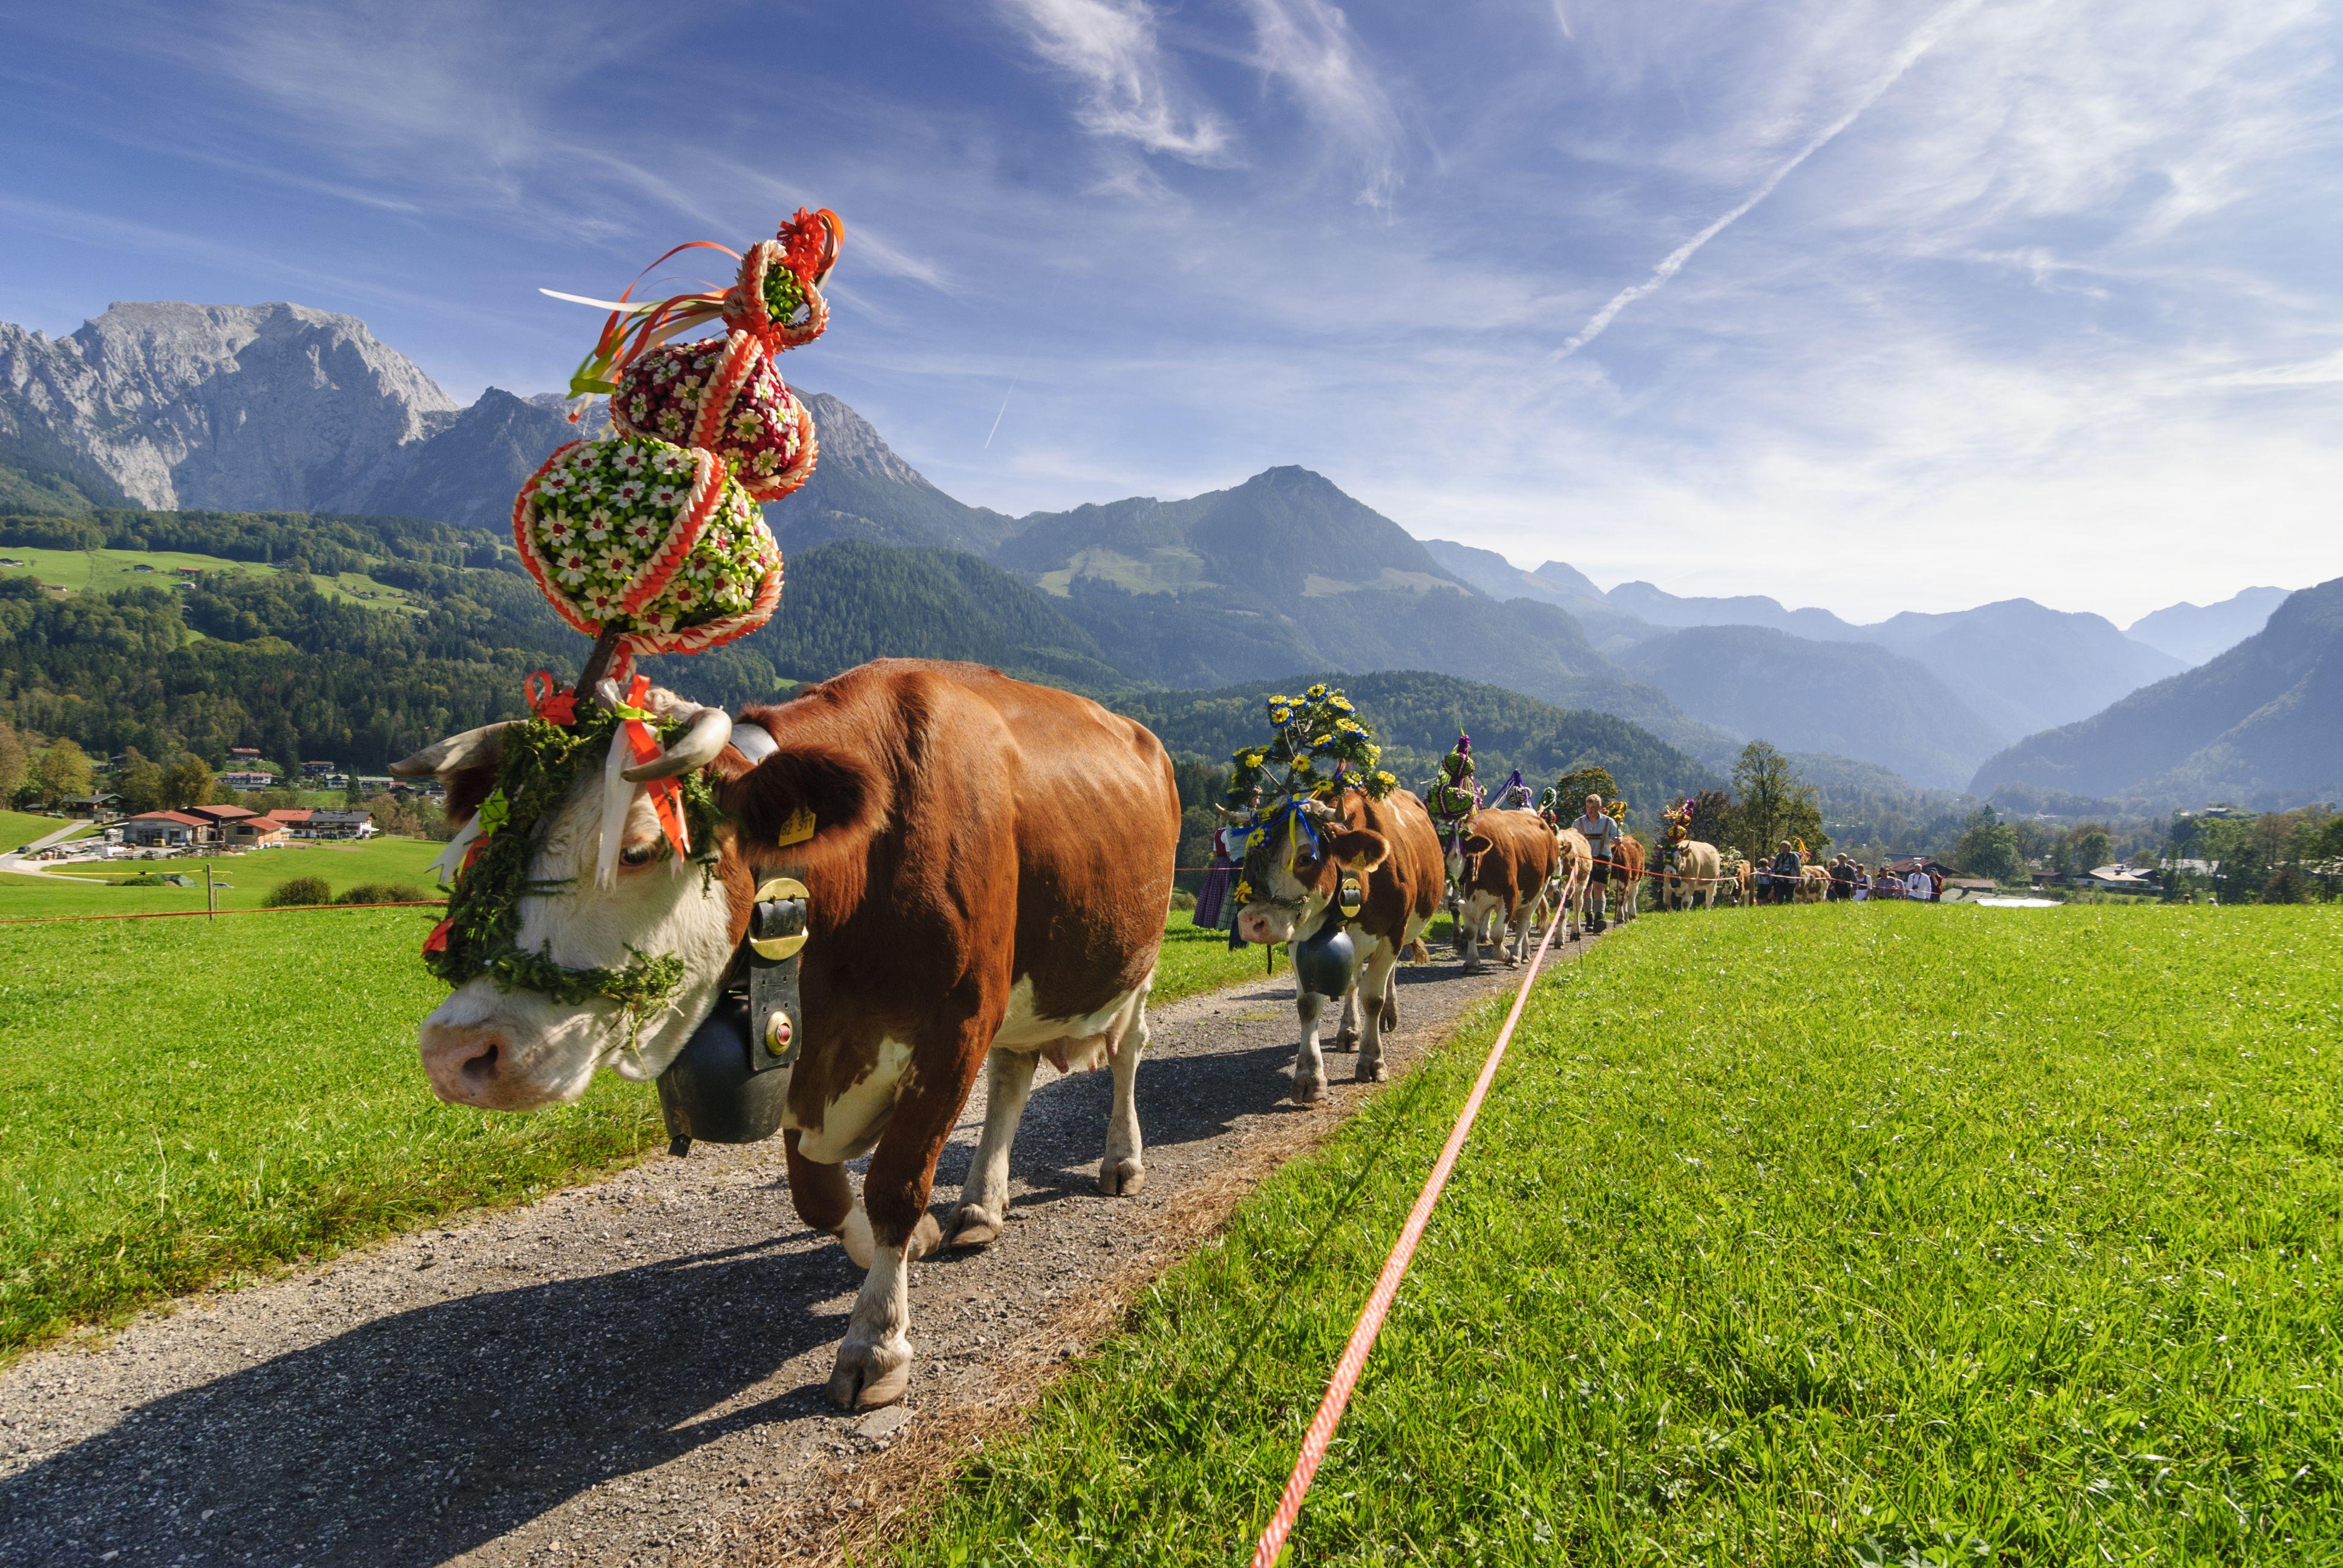 Almabtrieb der Kühe, geschmückt mit Fuikln